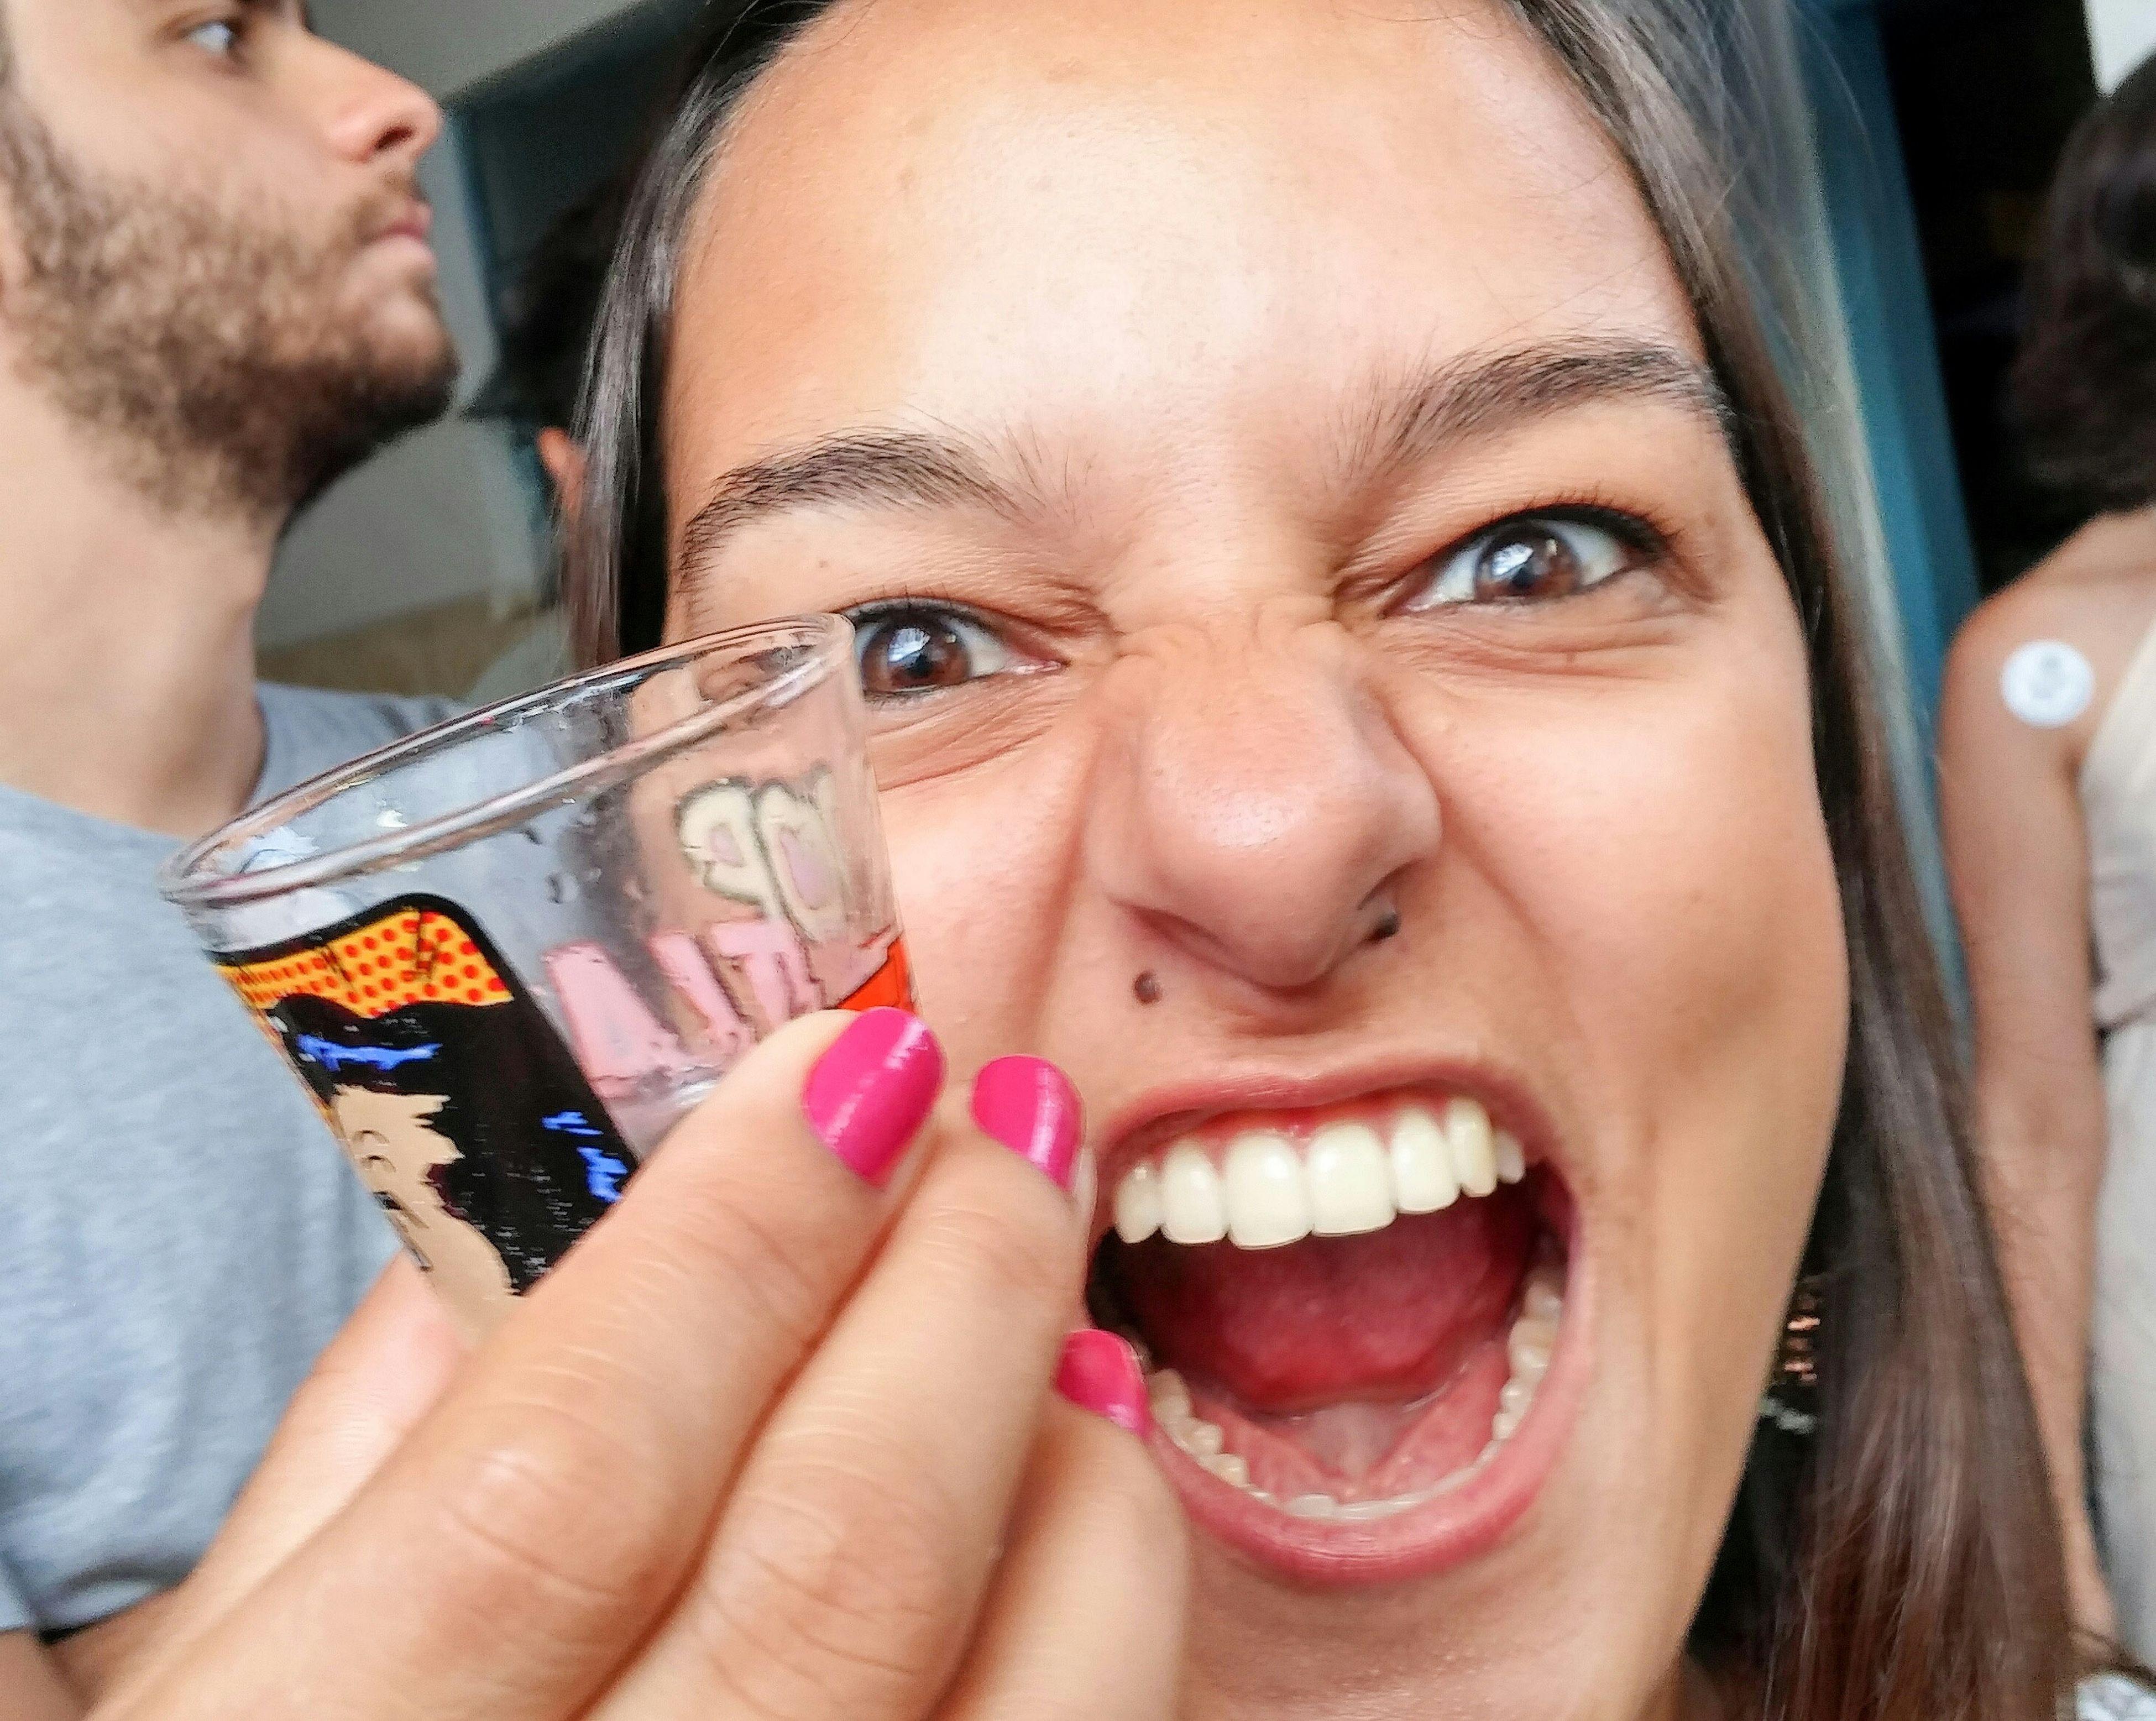 Friend Party Shot Drinking Crazy Friends Crazy Face